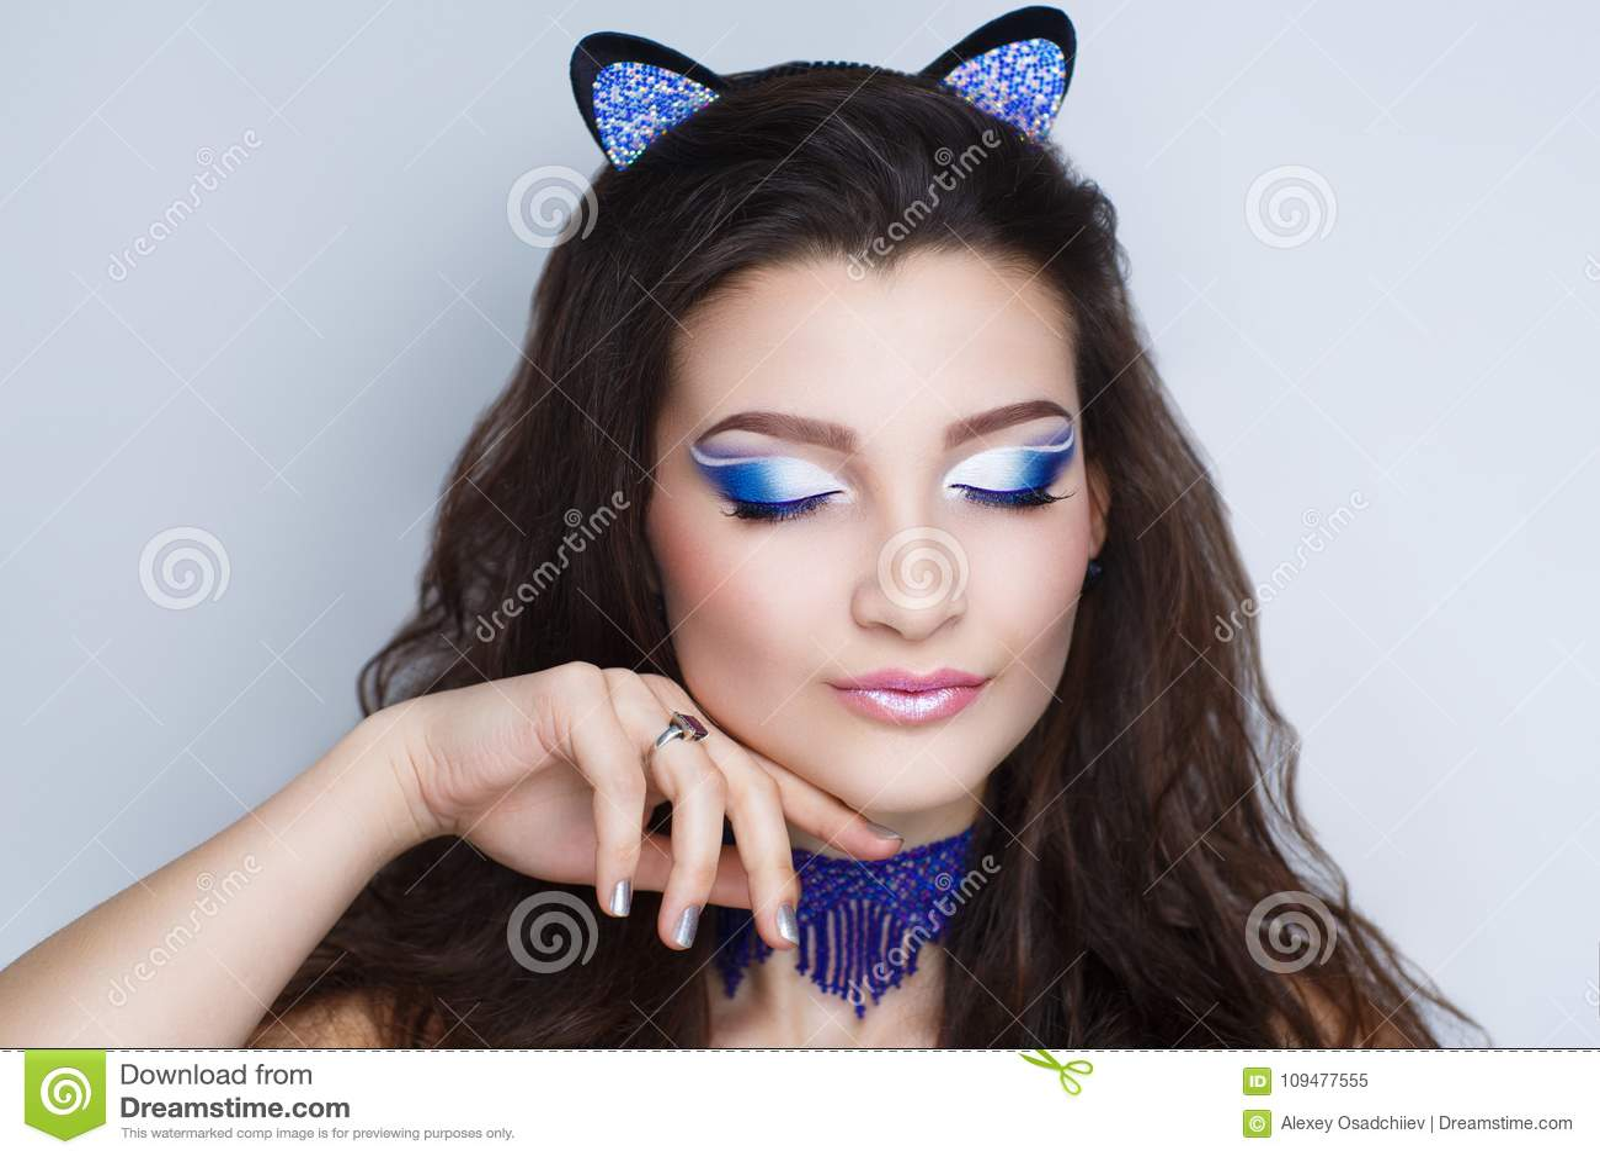 c9899f1dbf6 Ομορφιά αυτιών γατών γυναικών Στοκ Εικόνα - εικόνα από καρναβάλι ...